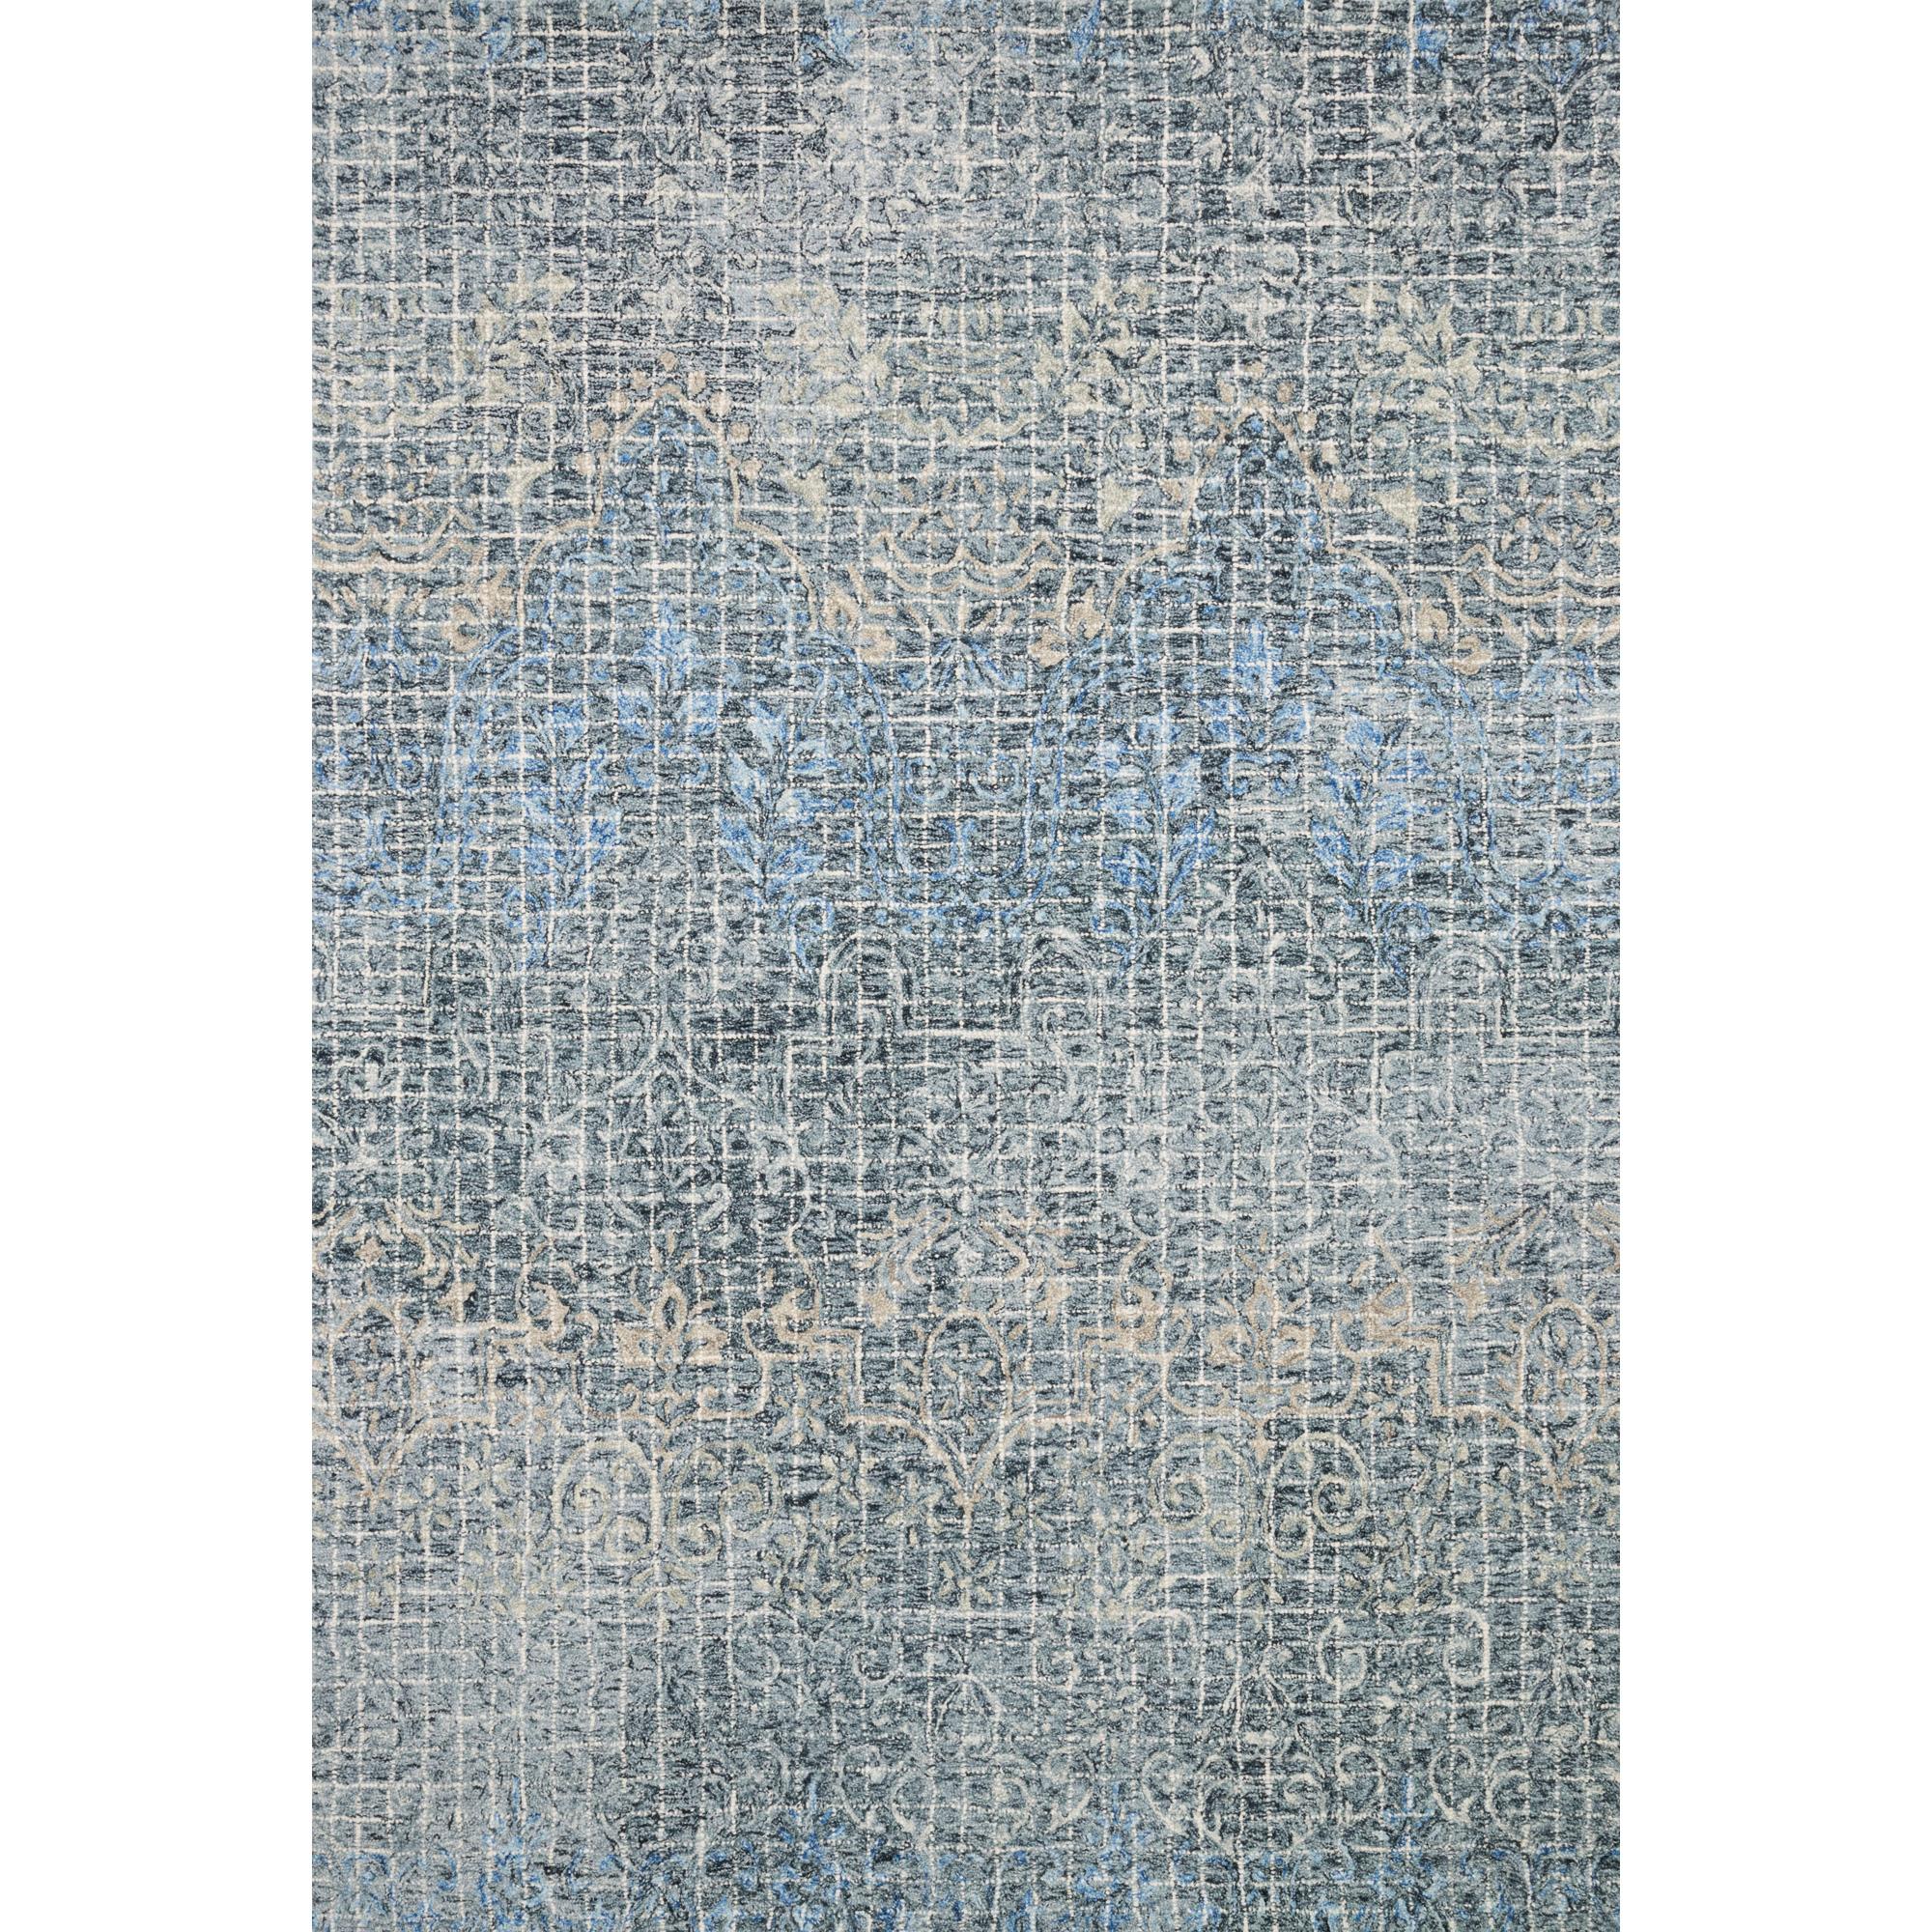 Loloi | Tatum Ink Blue 5x8 Area Rug